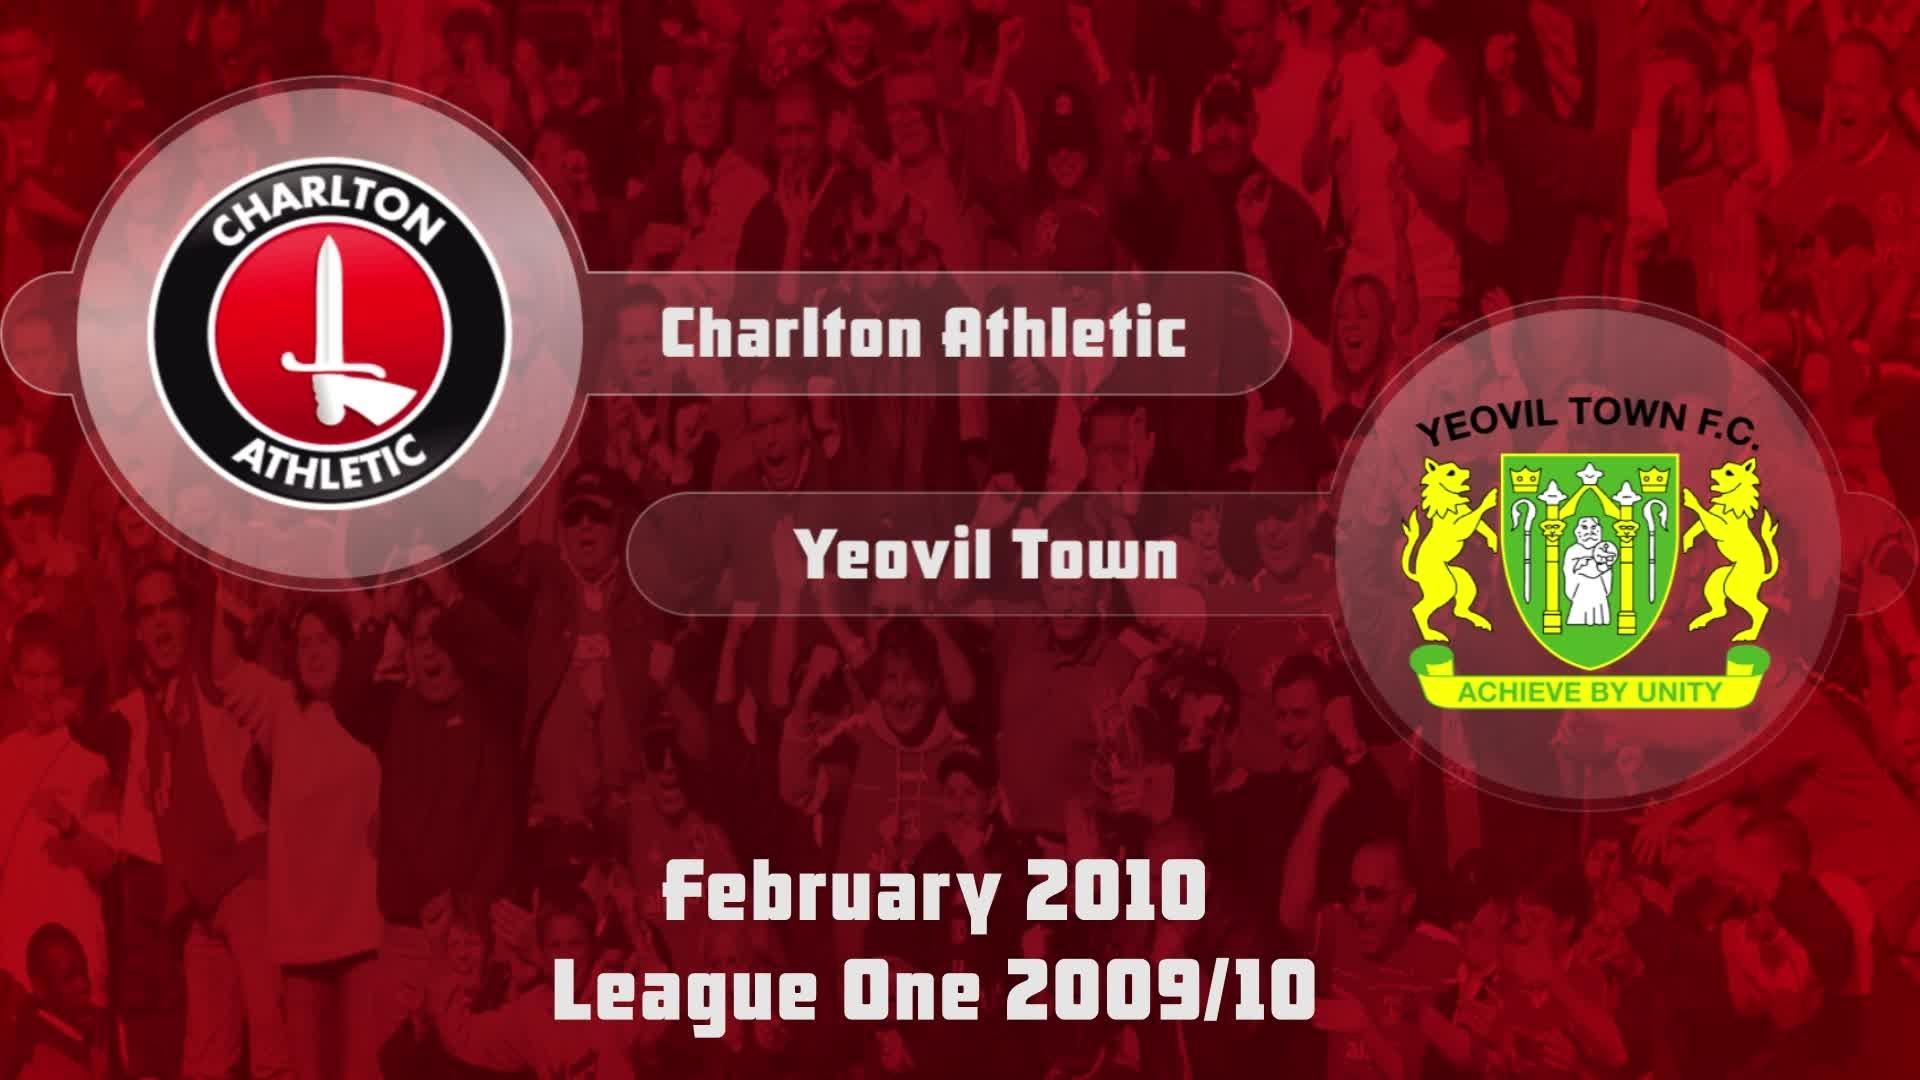 36 HIGHLIGHTS | Charlton 2 Yeovil 0 (Feb 2010)